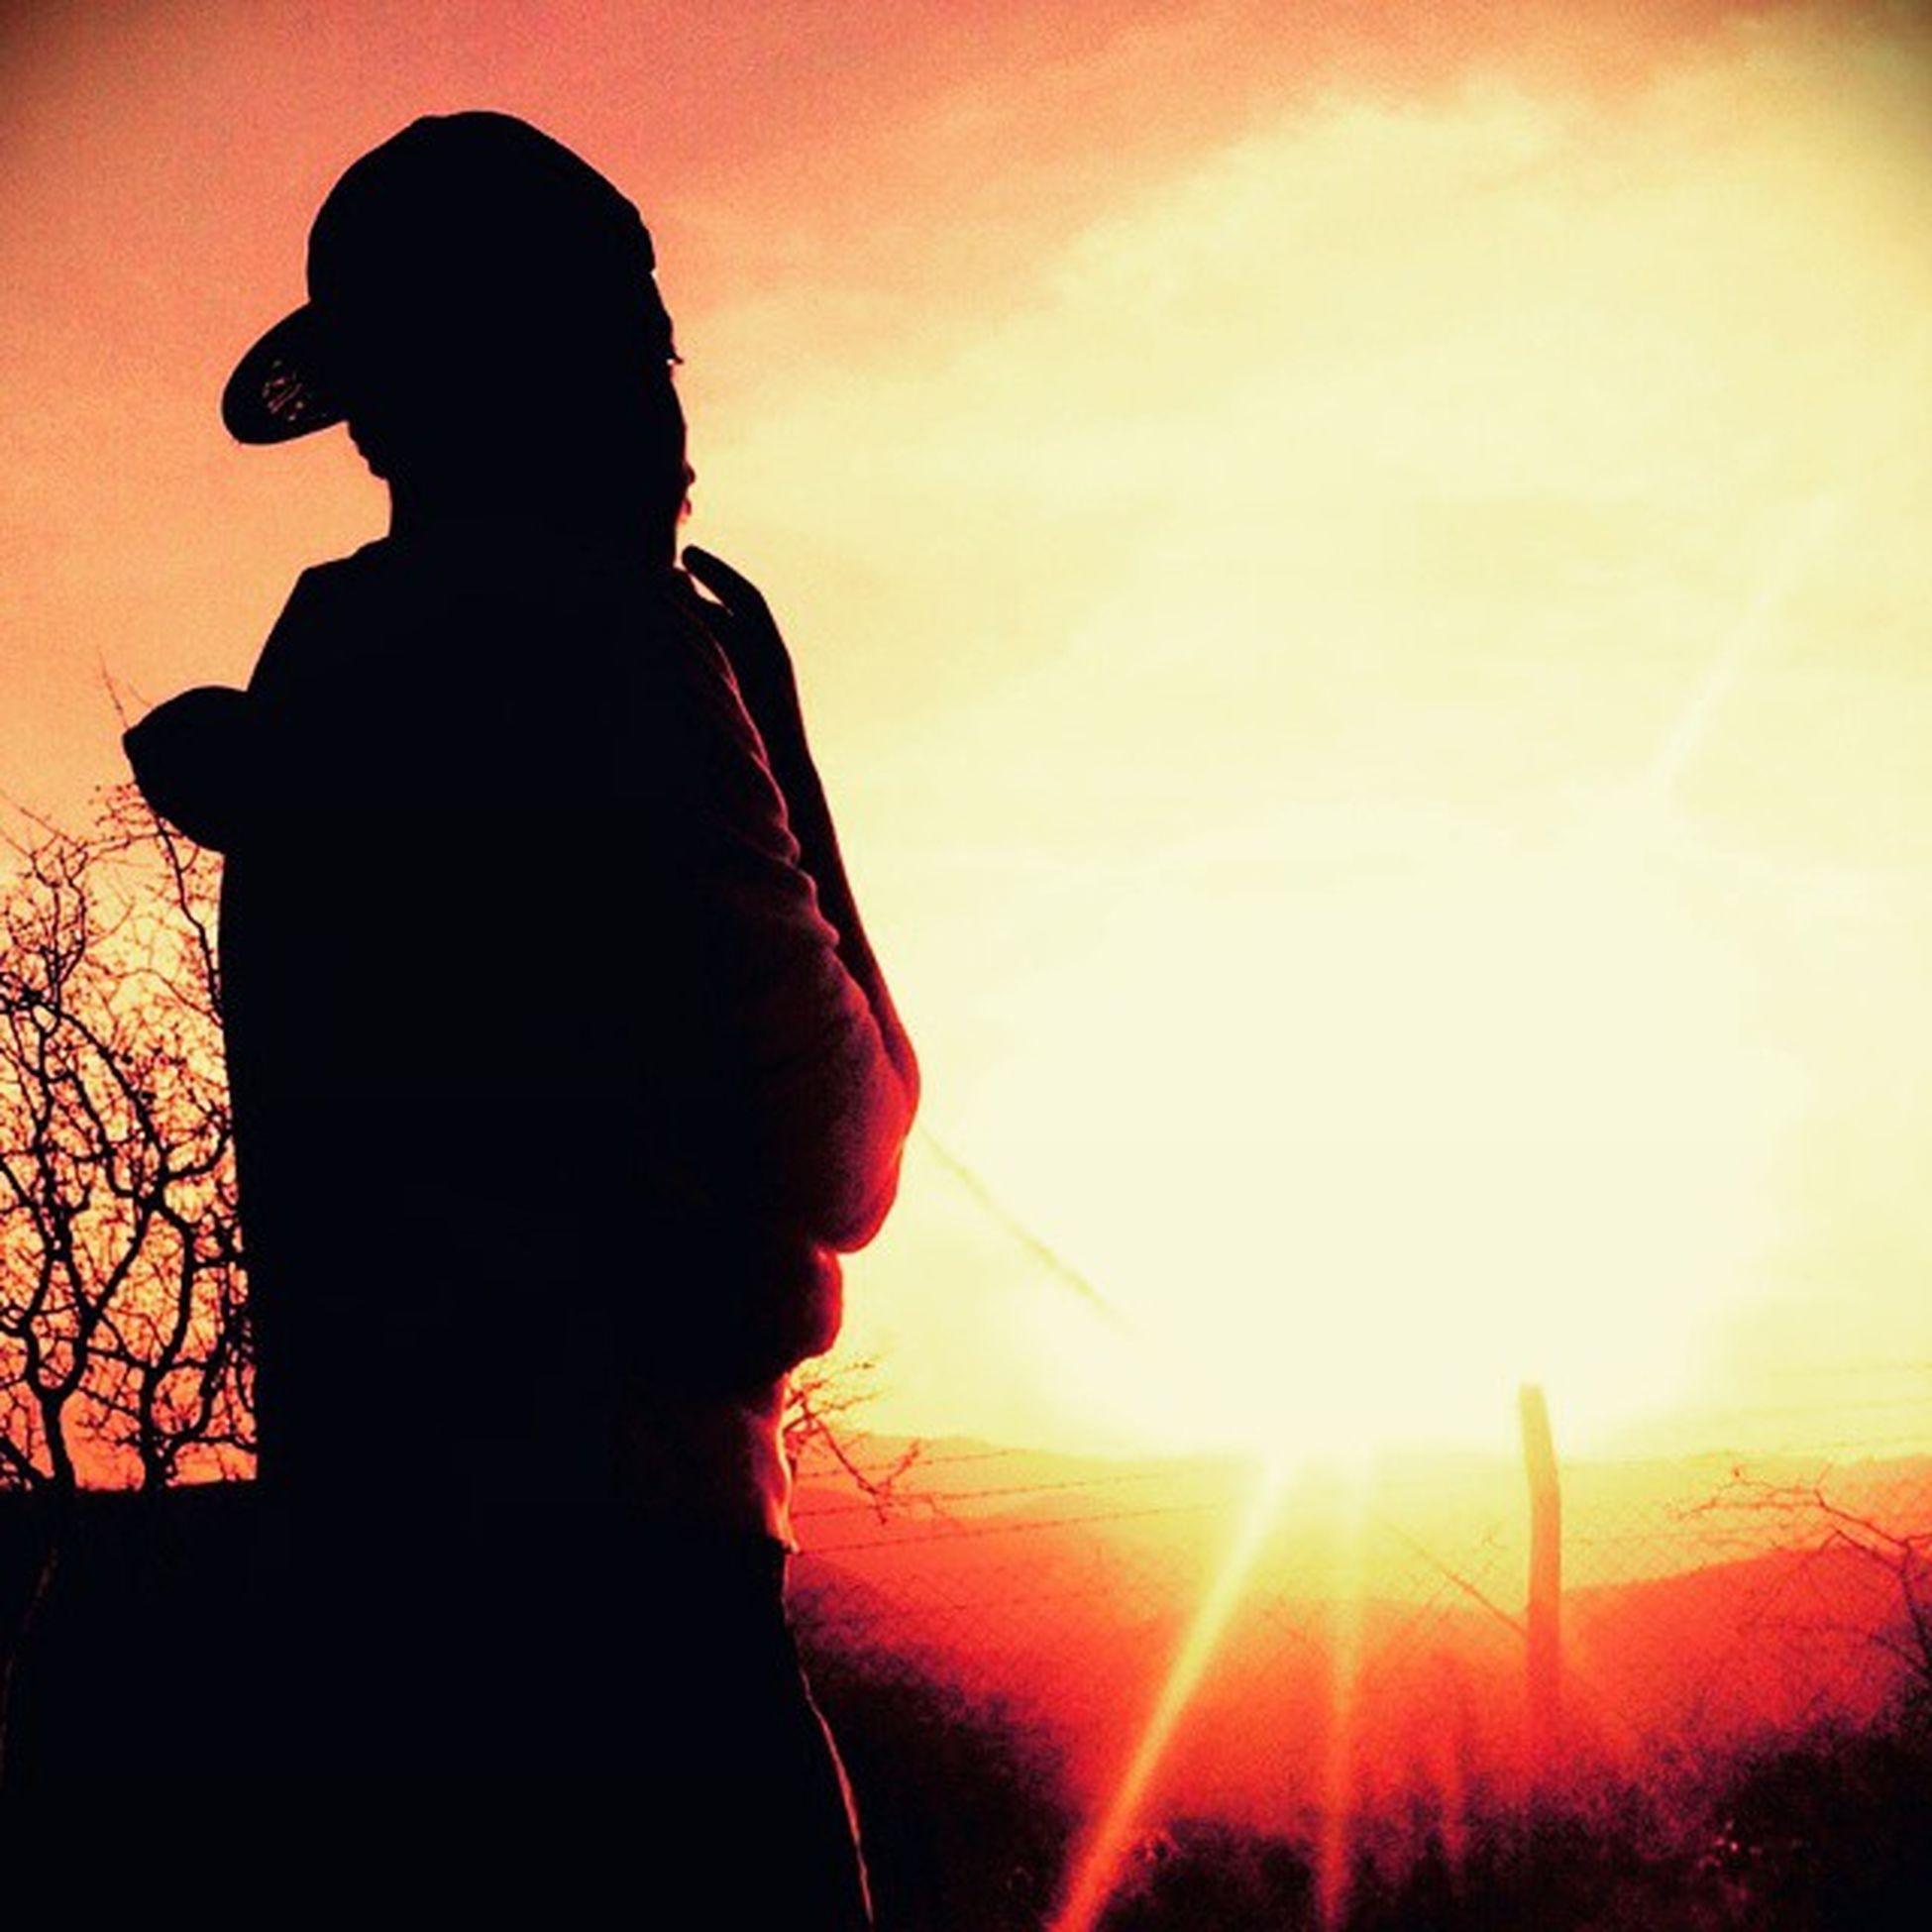 Thinking. Pondering. Was this sun always so bright n beautiful?? Ghost TtuCviews TheTsavoEdge Sunsets Beautifulpeople